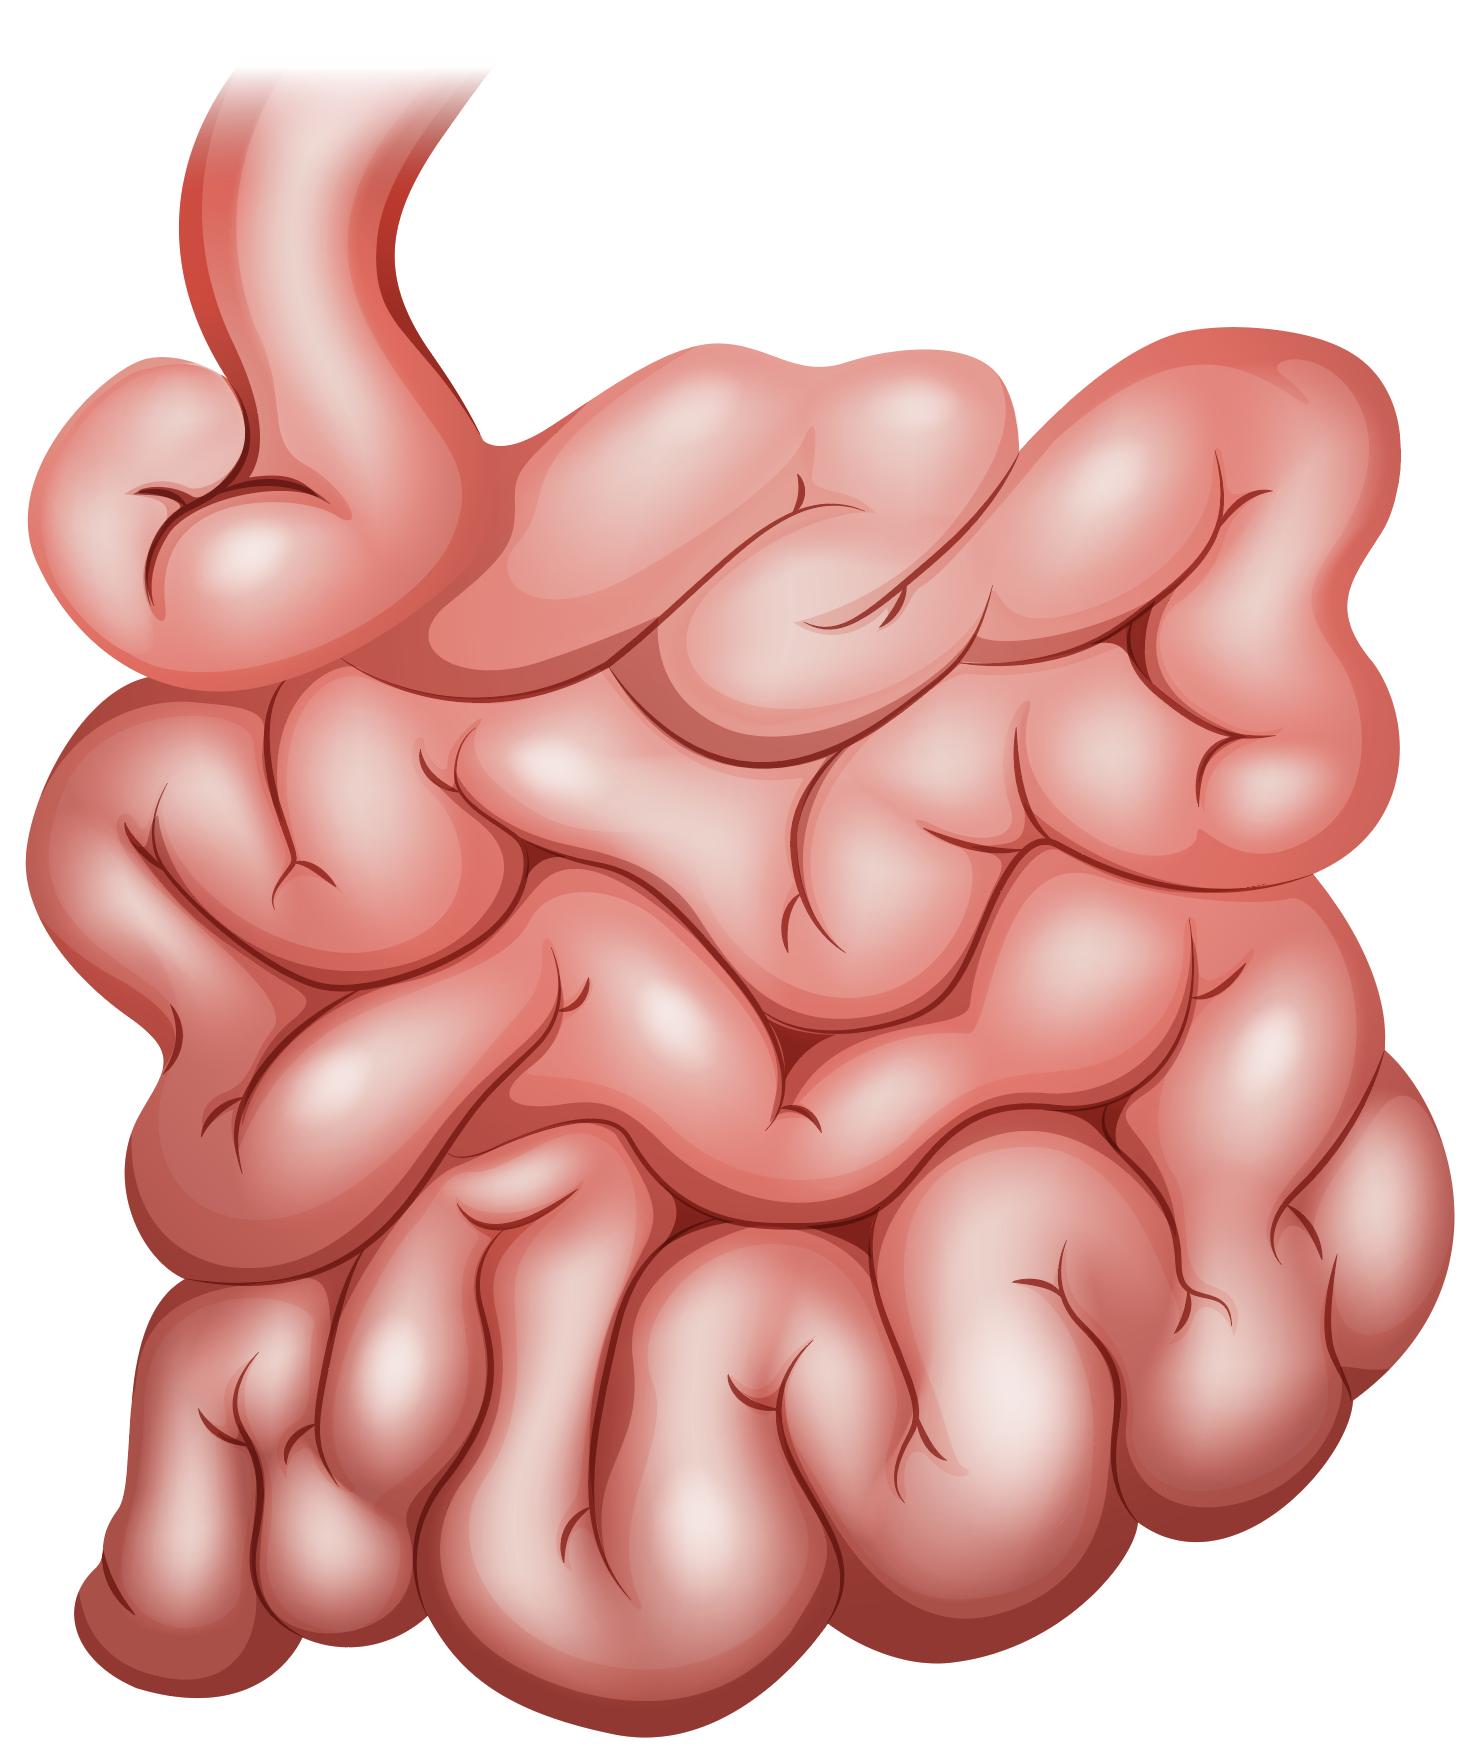 Small Bowel -